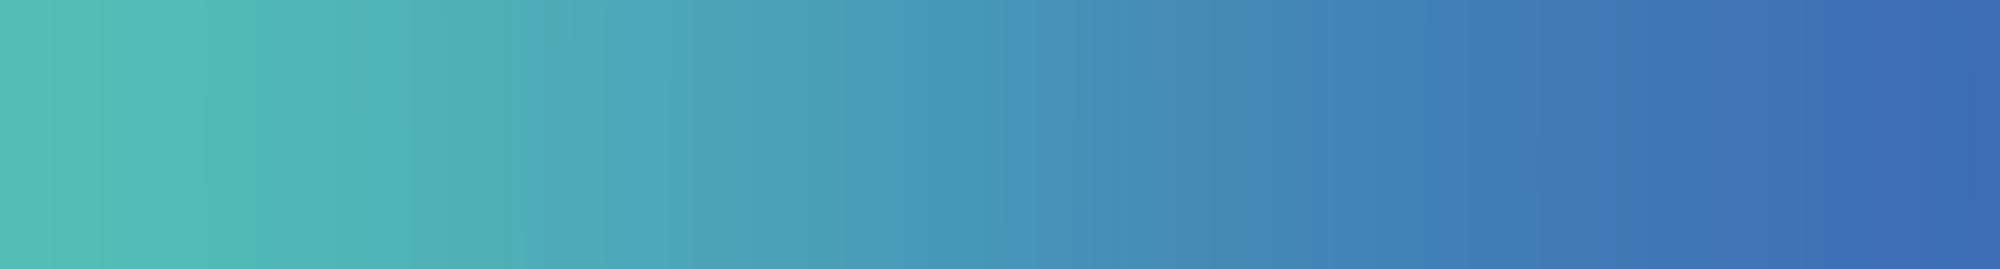 rgb-gradient bar for logo-carrasel